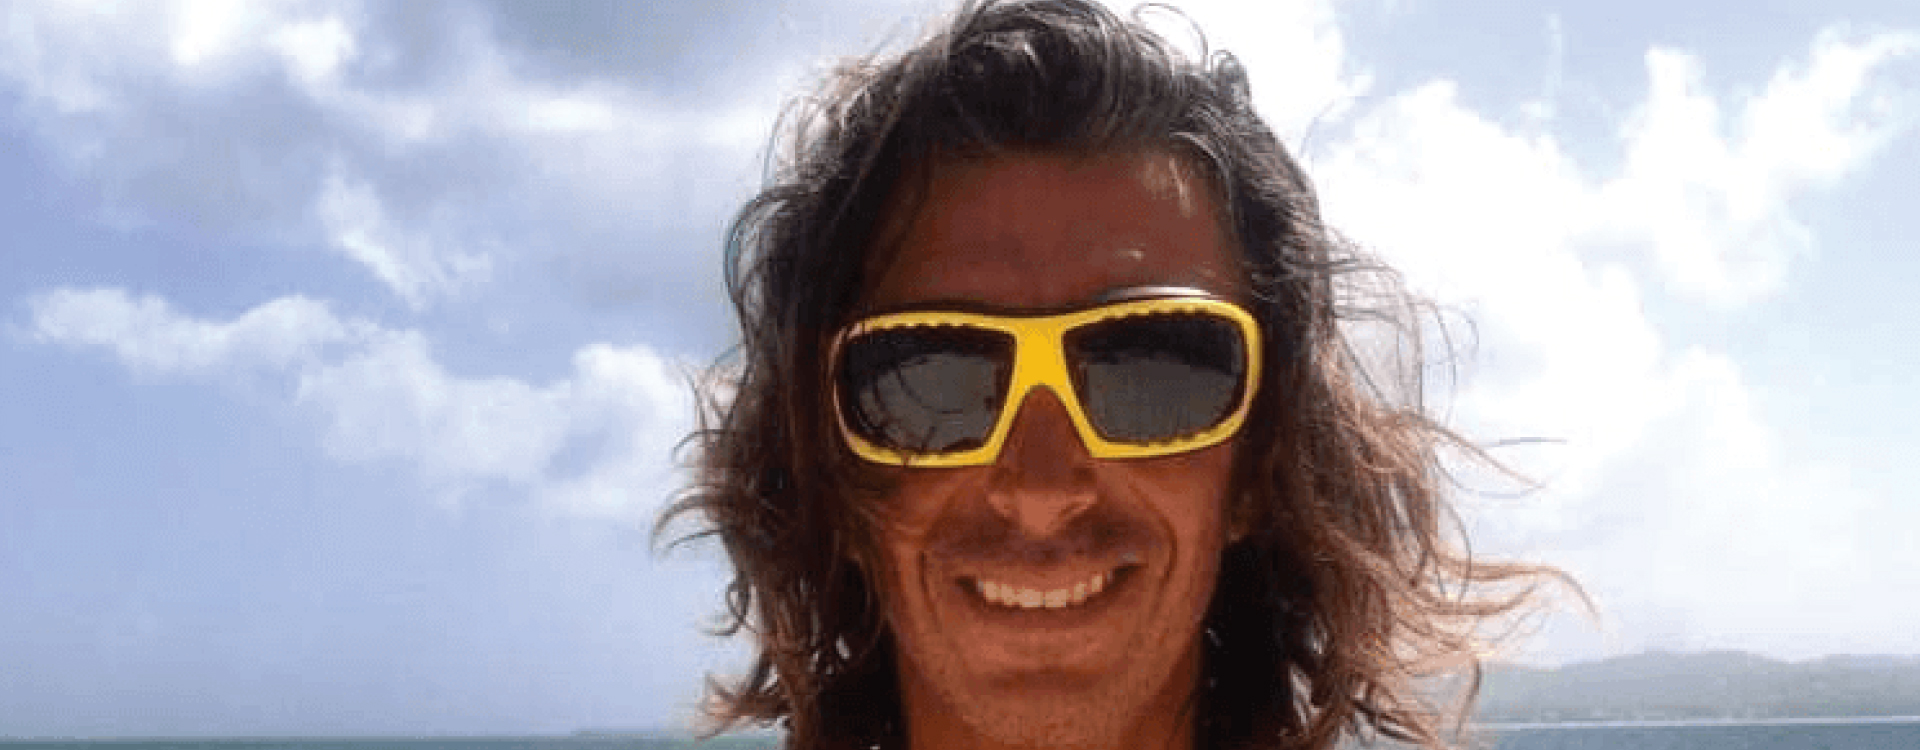 iko kitesurf assistant trainer guido ruzzenenti